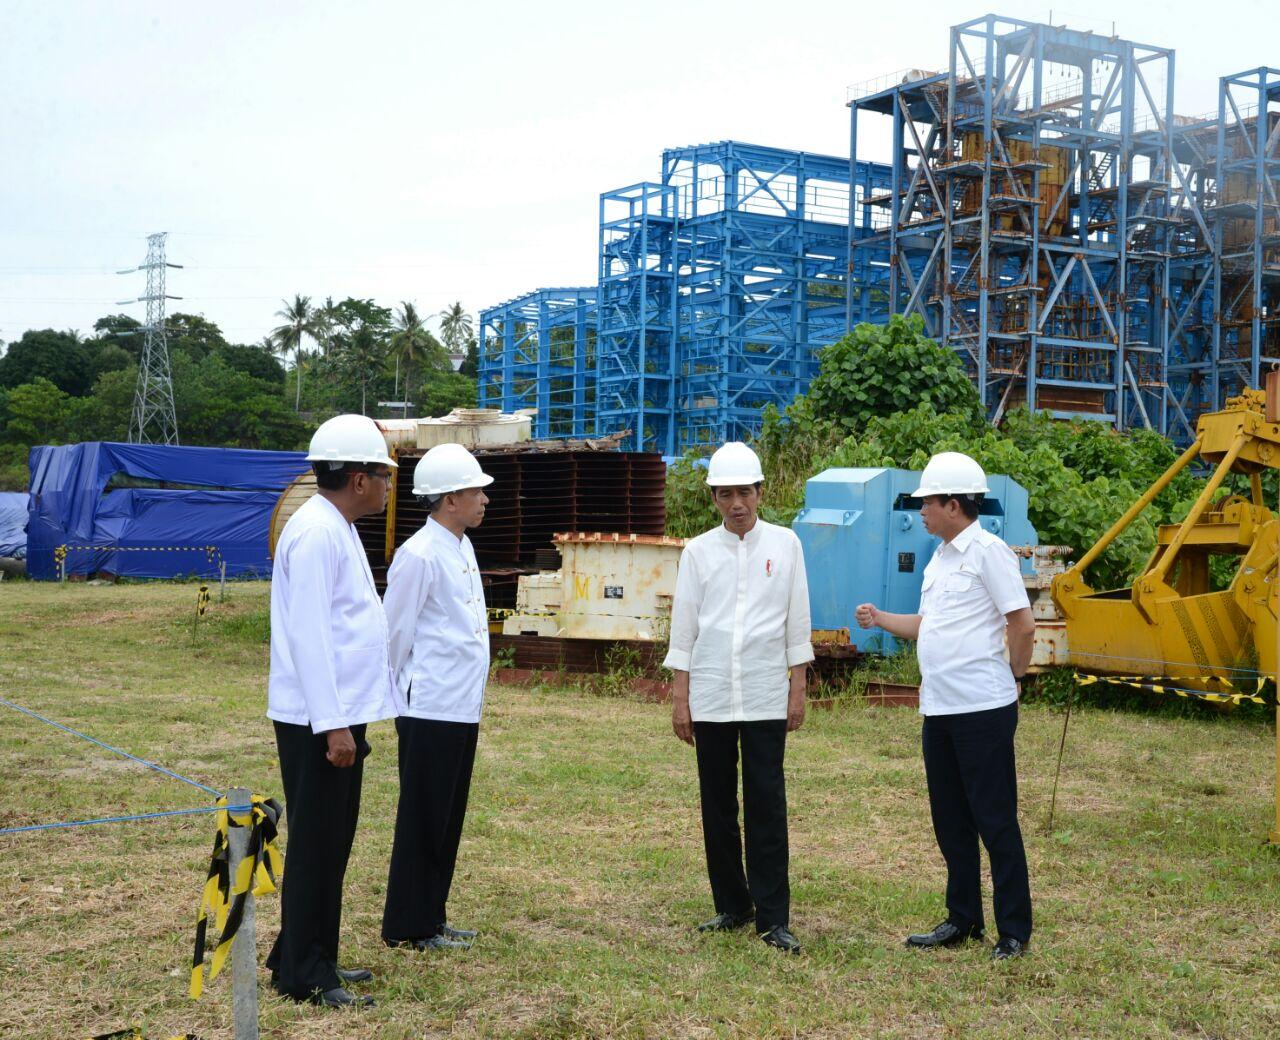 President Jokowi when inspecting 2 x 15 MW Steam-fuelled Power Plant (PLTU) in Waai Village, Central Maluku, on Thursday (9/2)